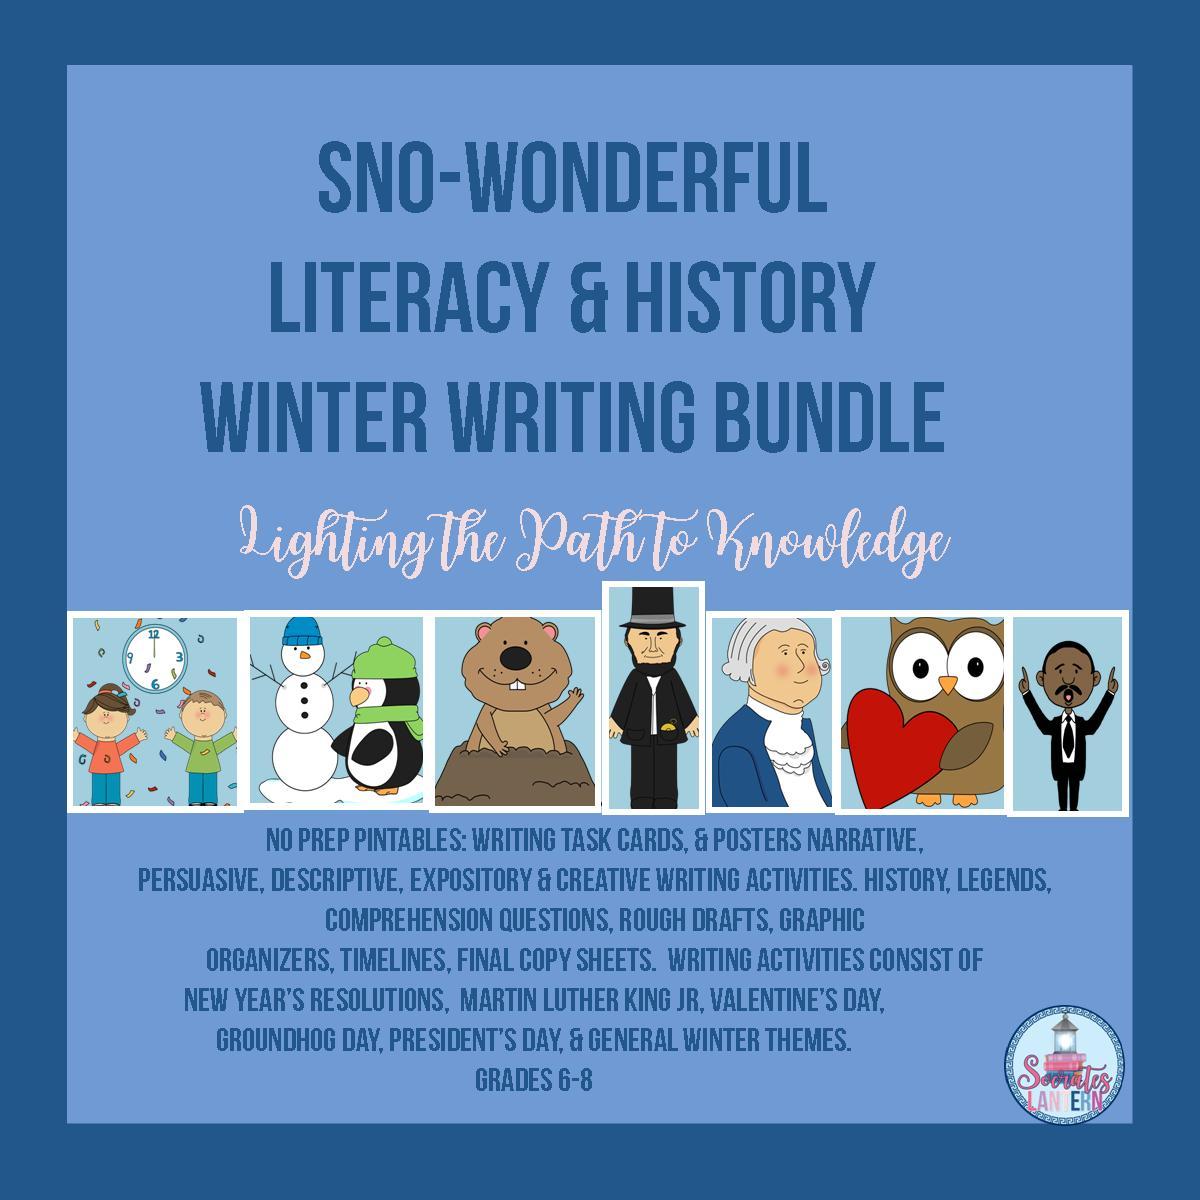 Sno-Wonderful Literacy/History Winter Writing Bundle Grades 6-8